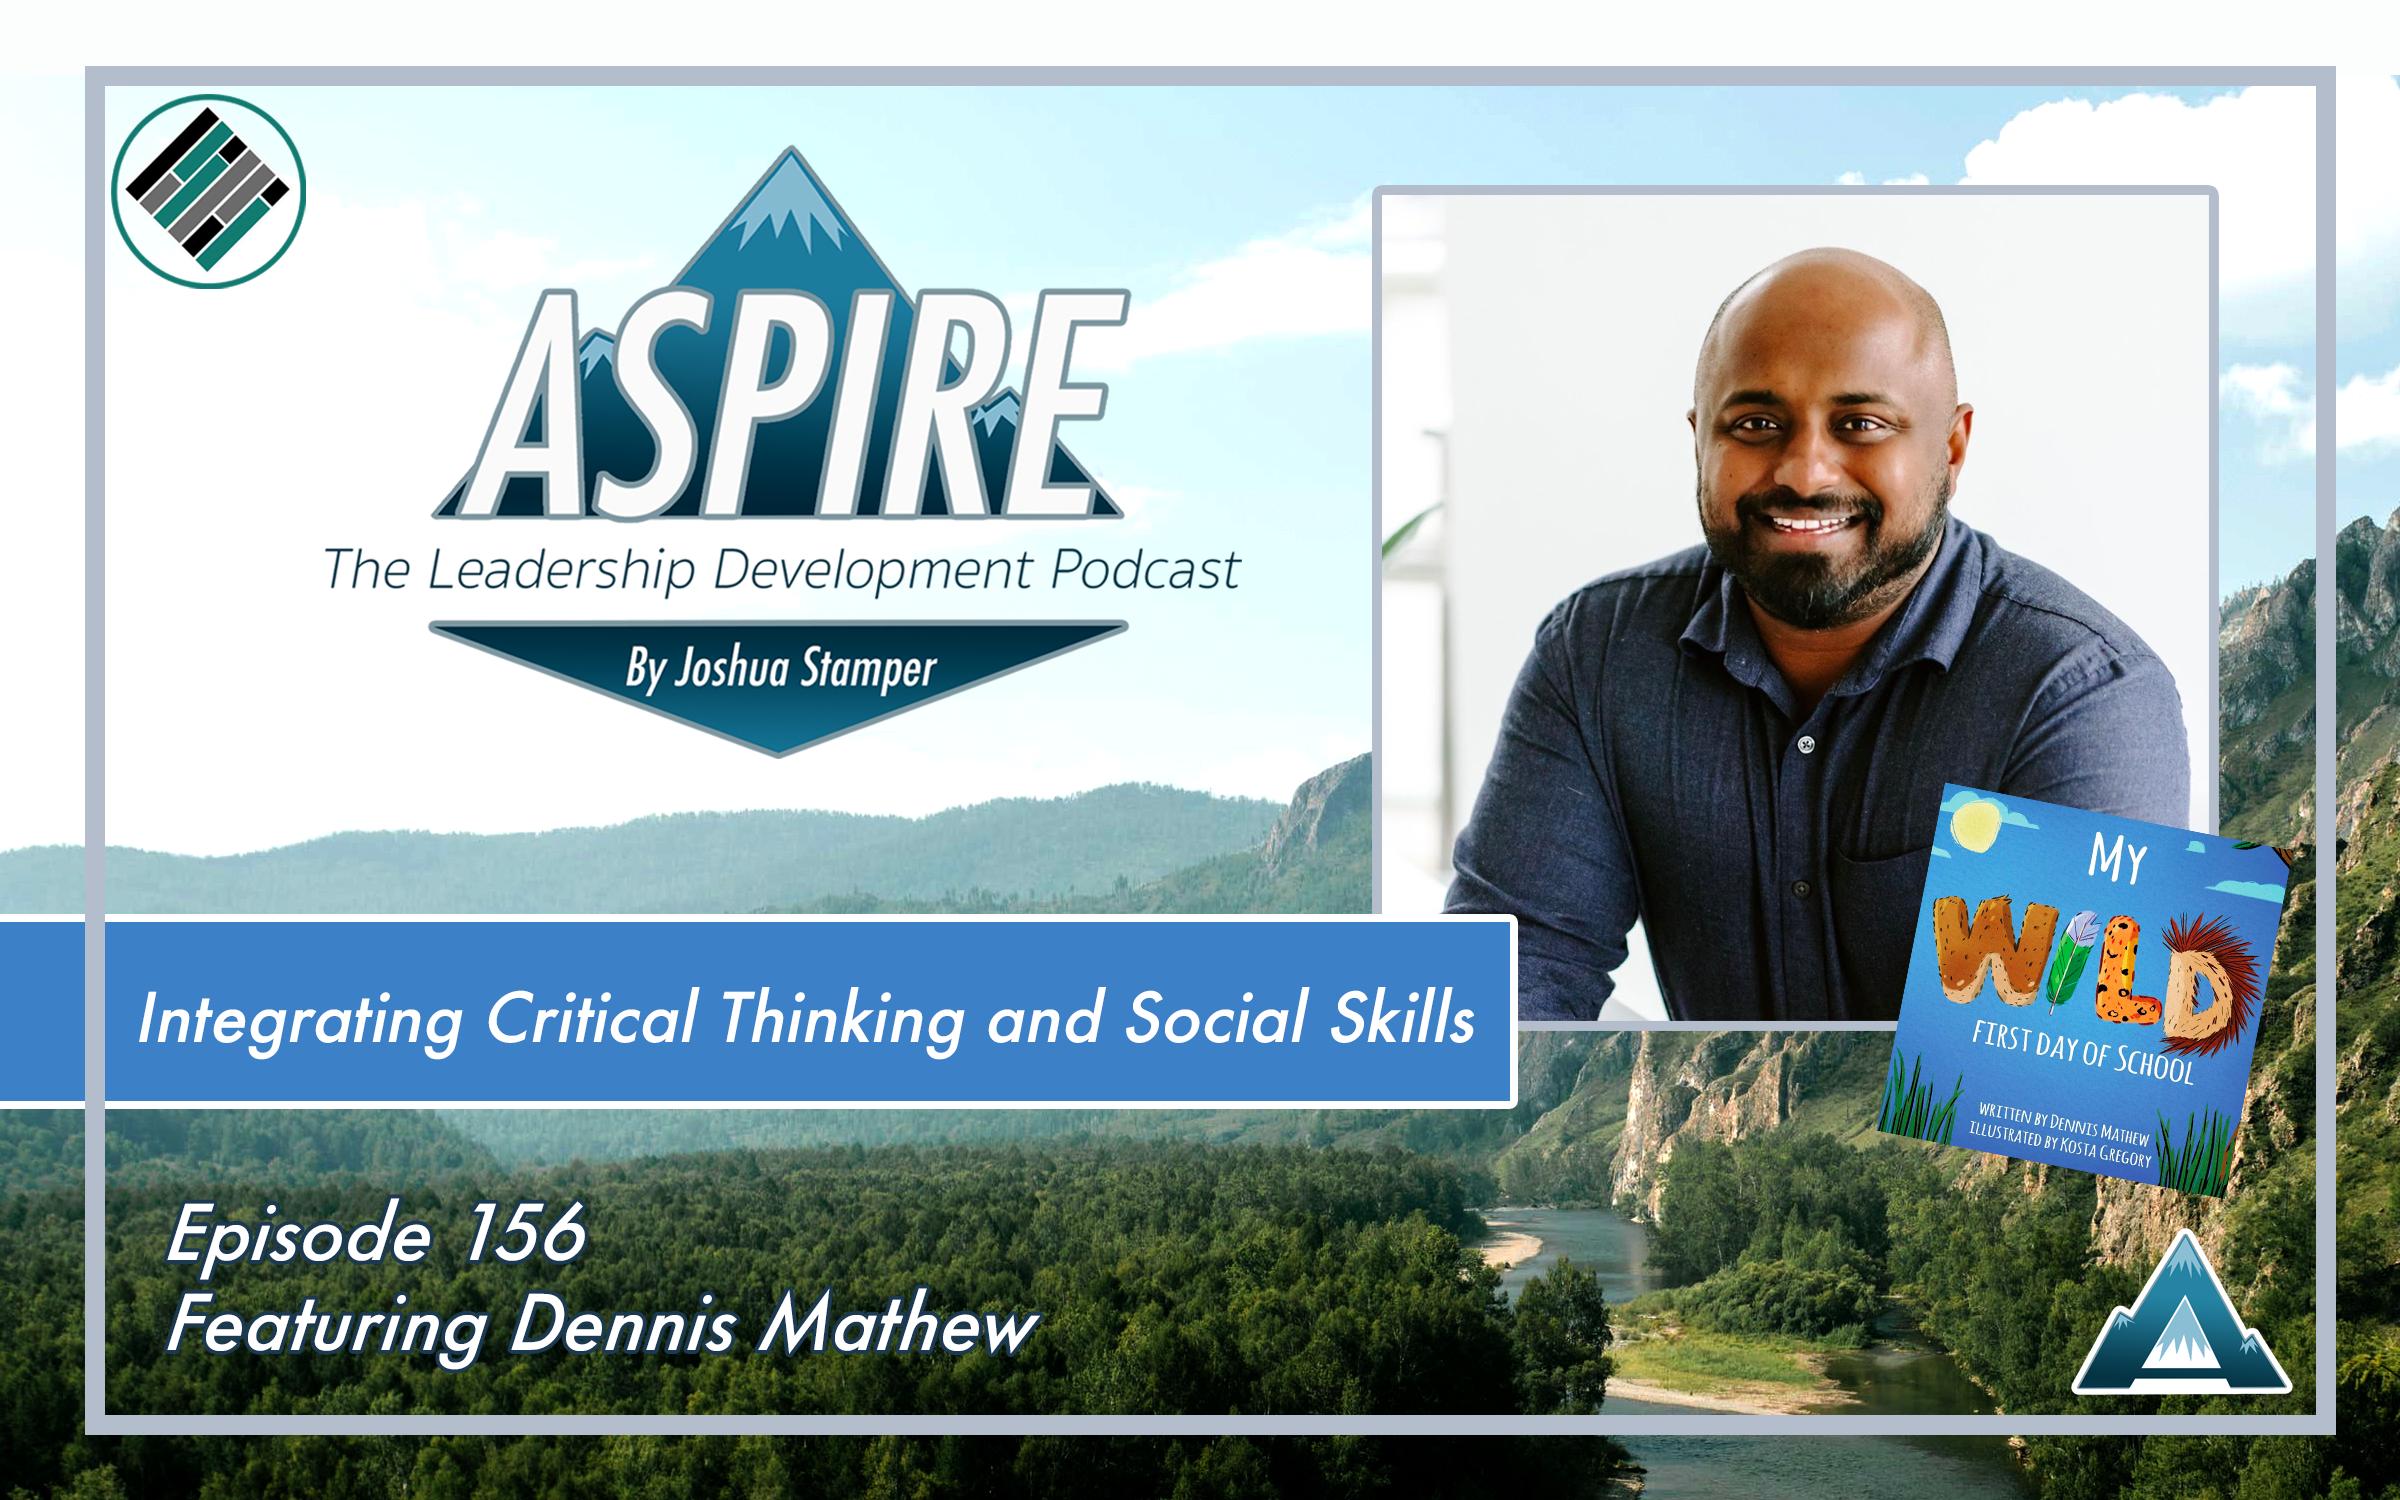 Joshua Stamper, Dennis Mathew, Aspire: The Leadership Development Podcast, #AspireLead